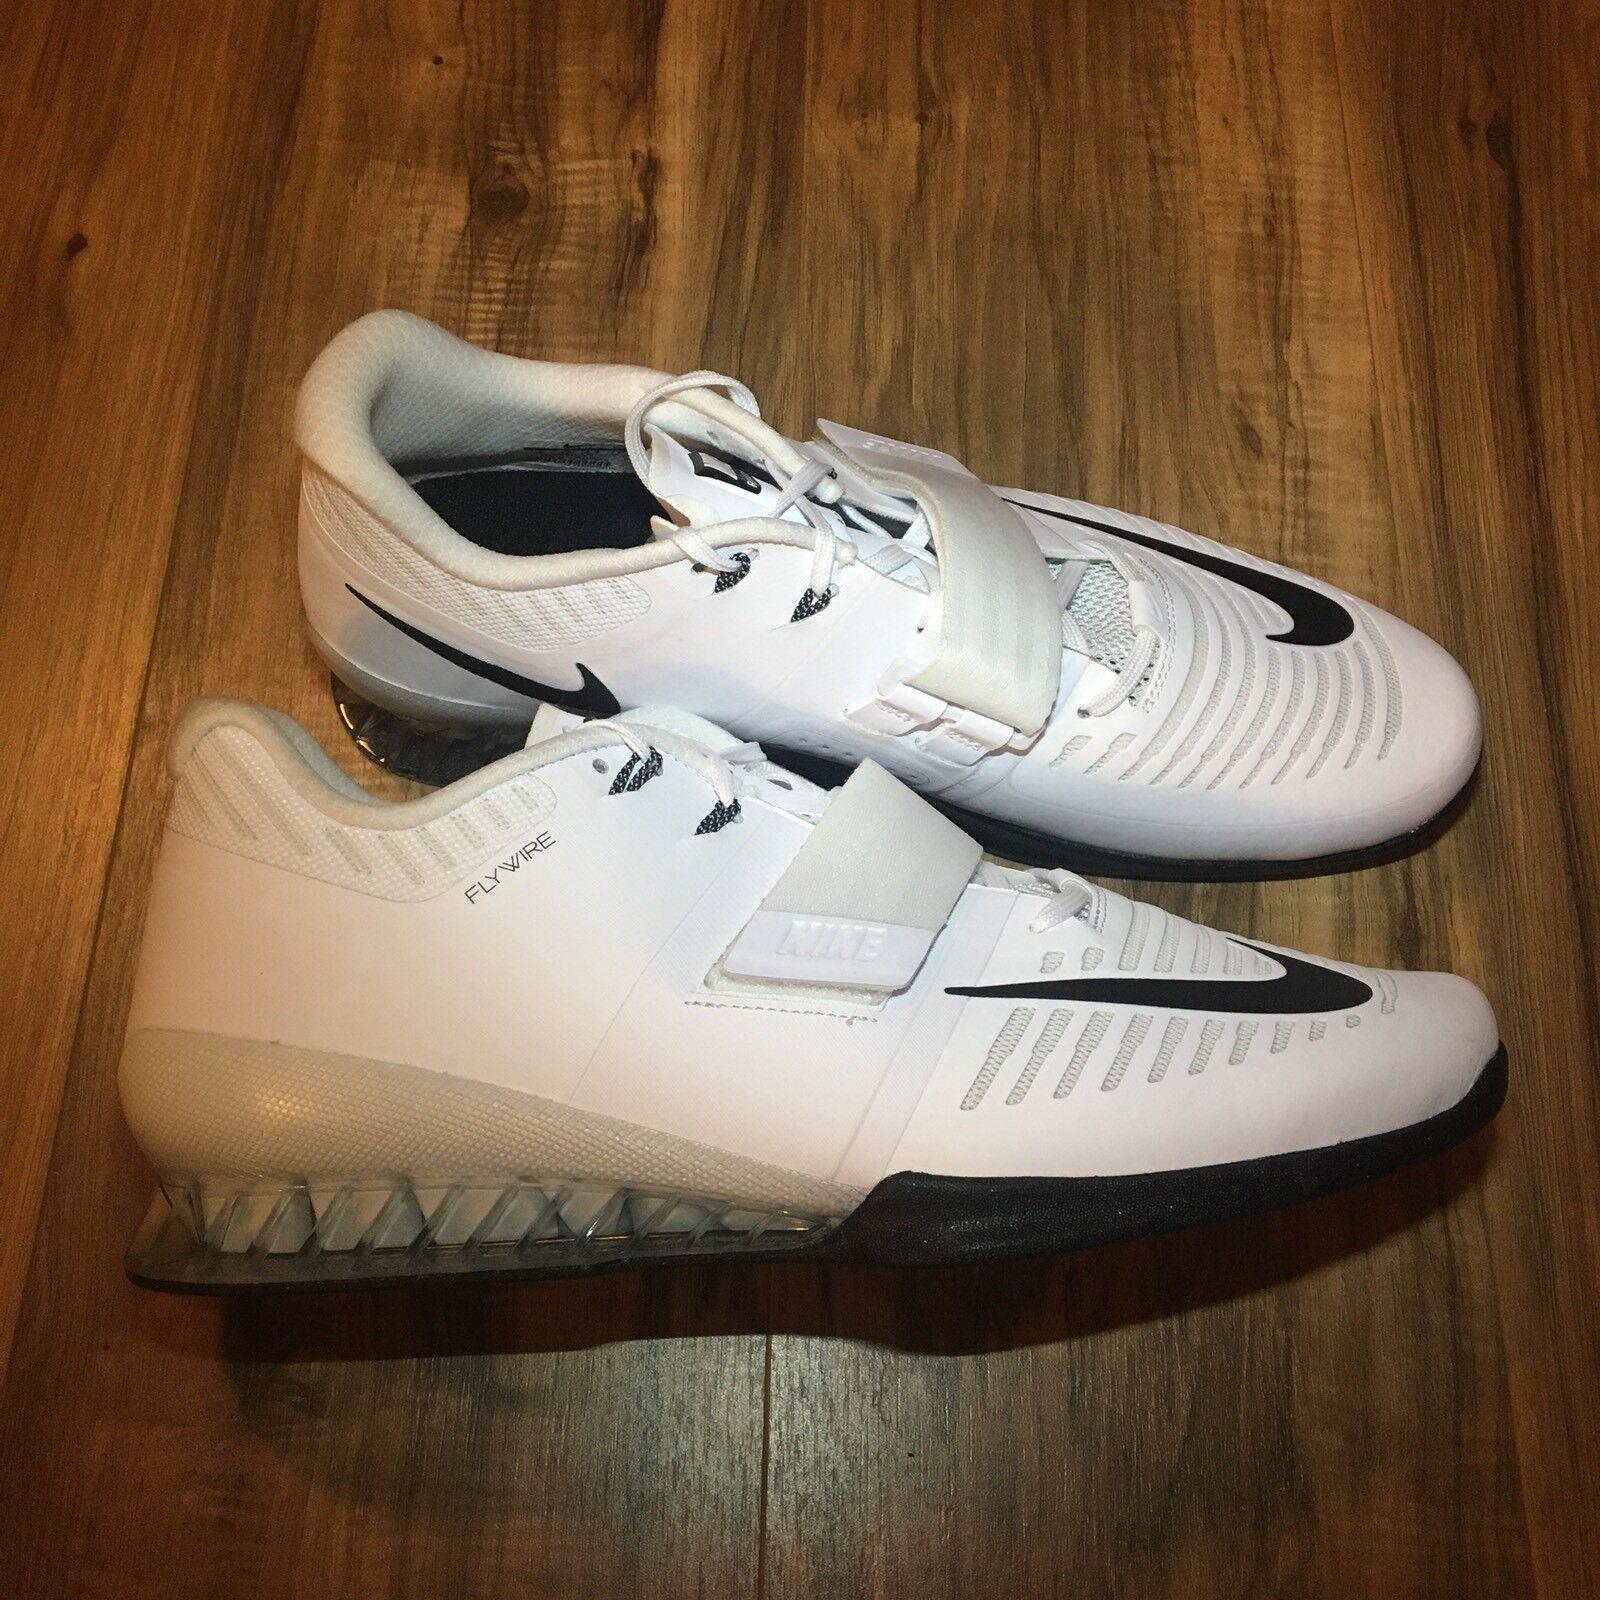 Nike romaleos 3 sollevamento pesi crossfit scarpe bianco nero 852933-100 Uomo dimensioni 15 crossfit pesi 17f5db